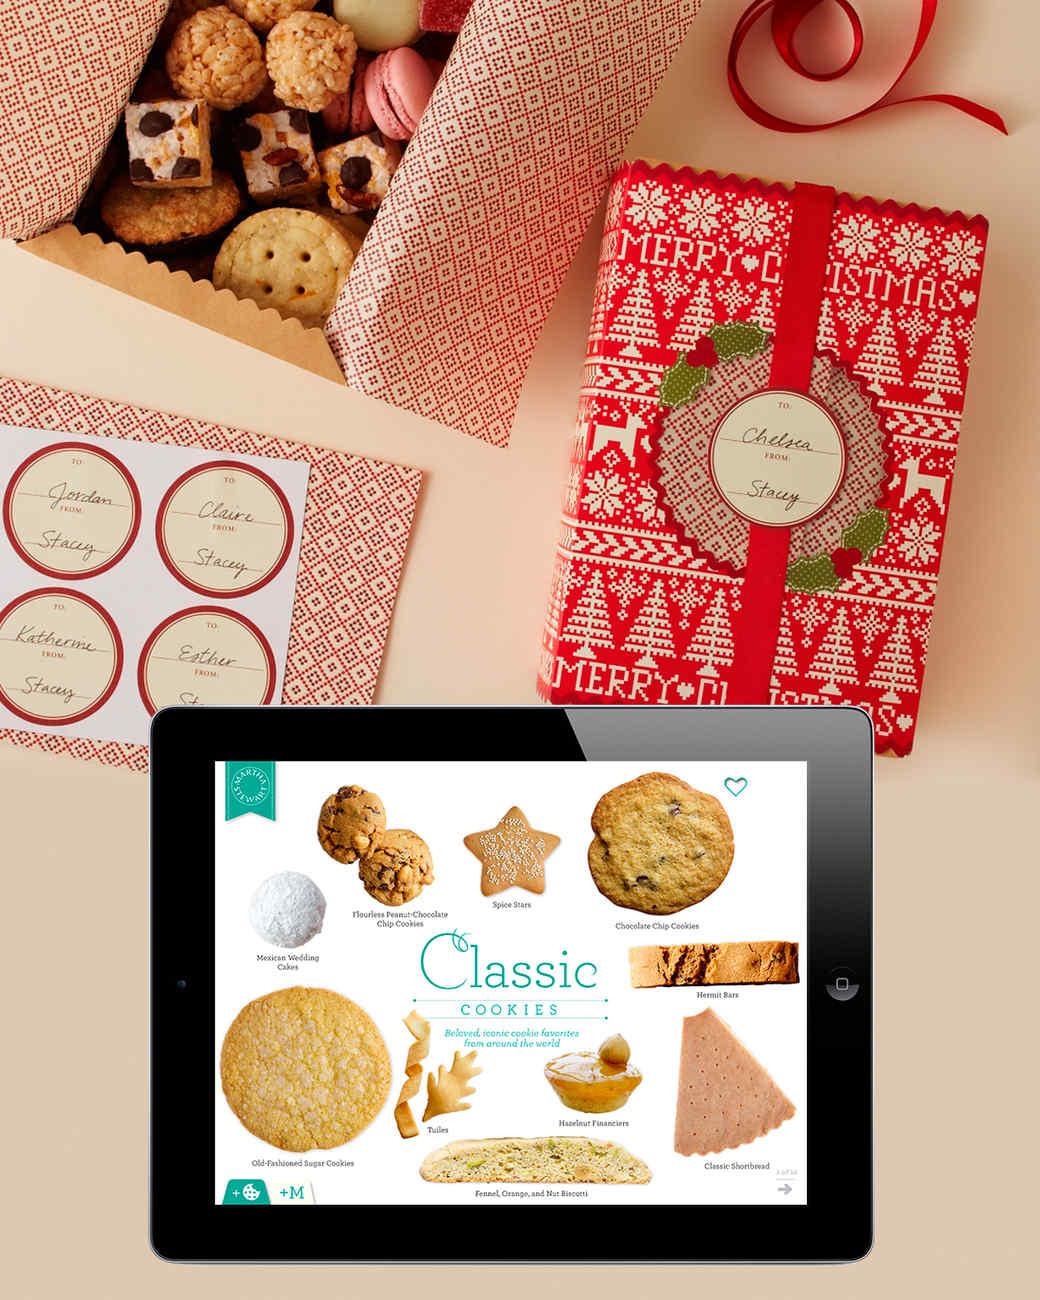 cookie-app-box-mrkt-1112.jpg